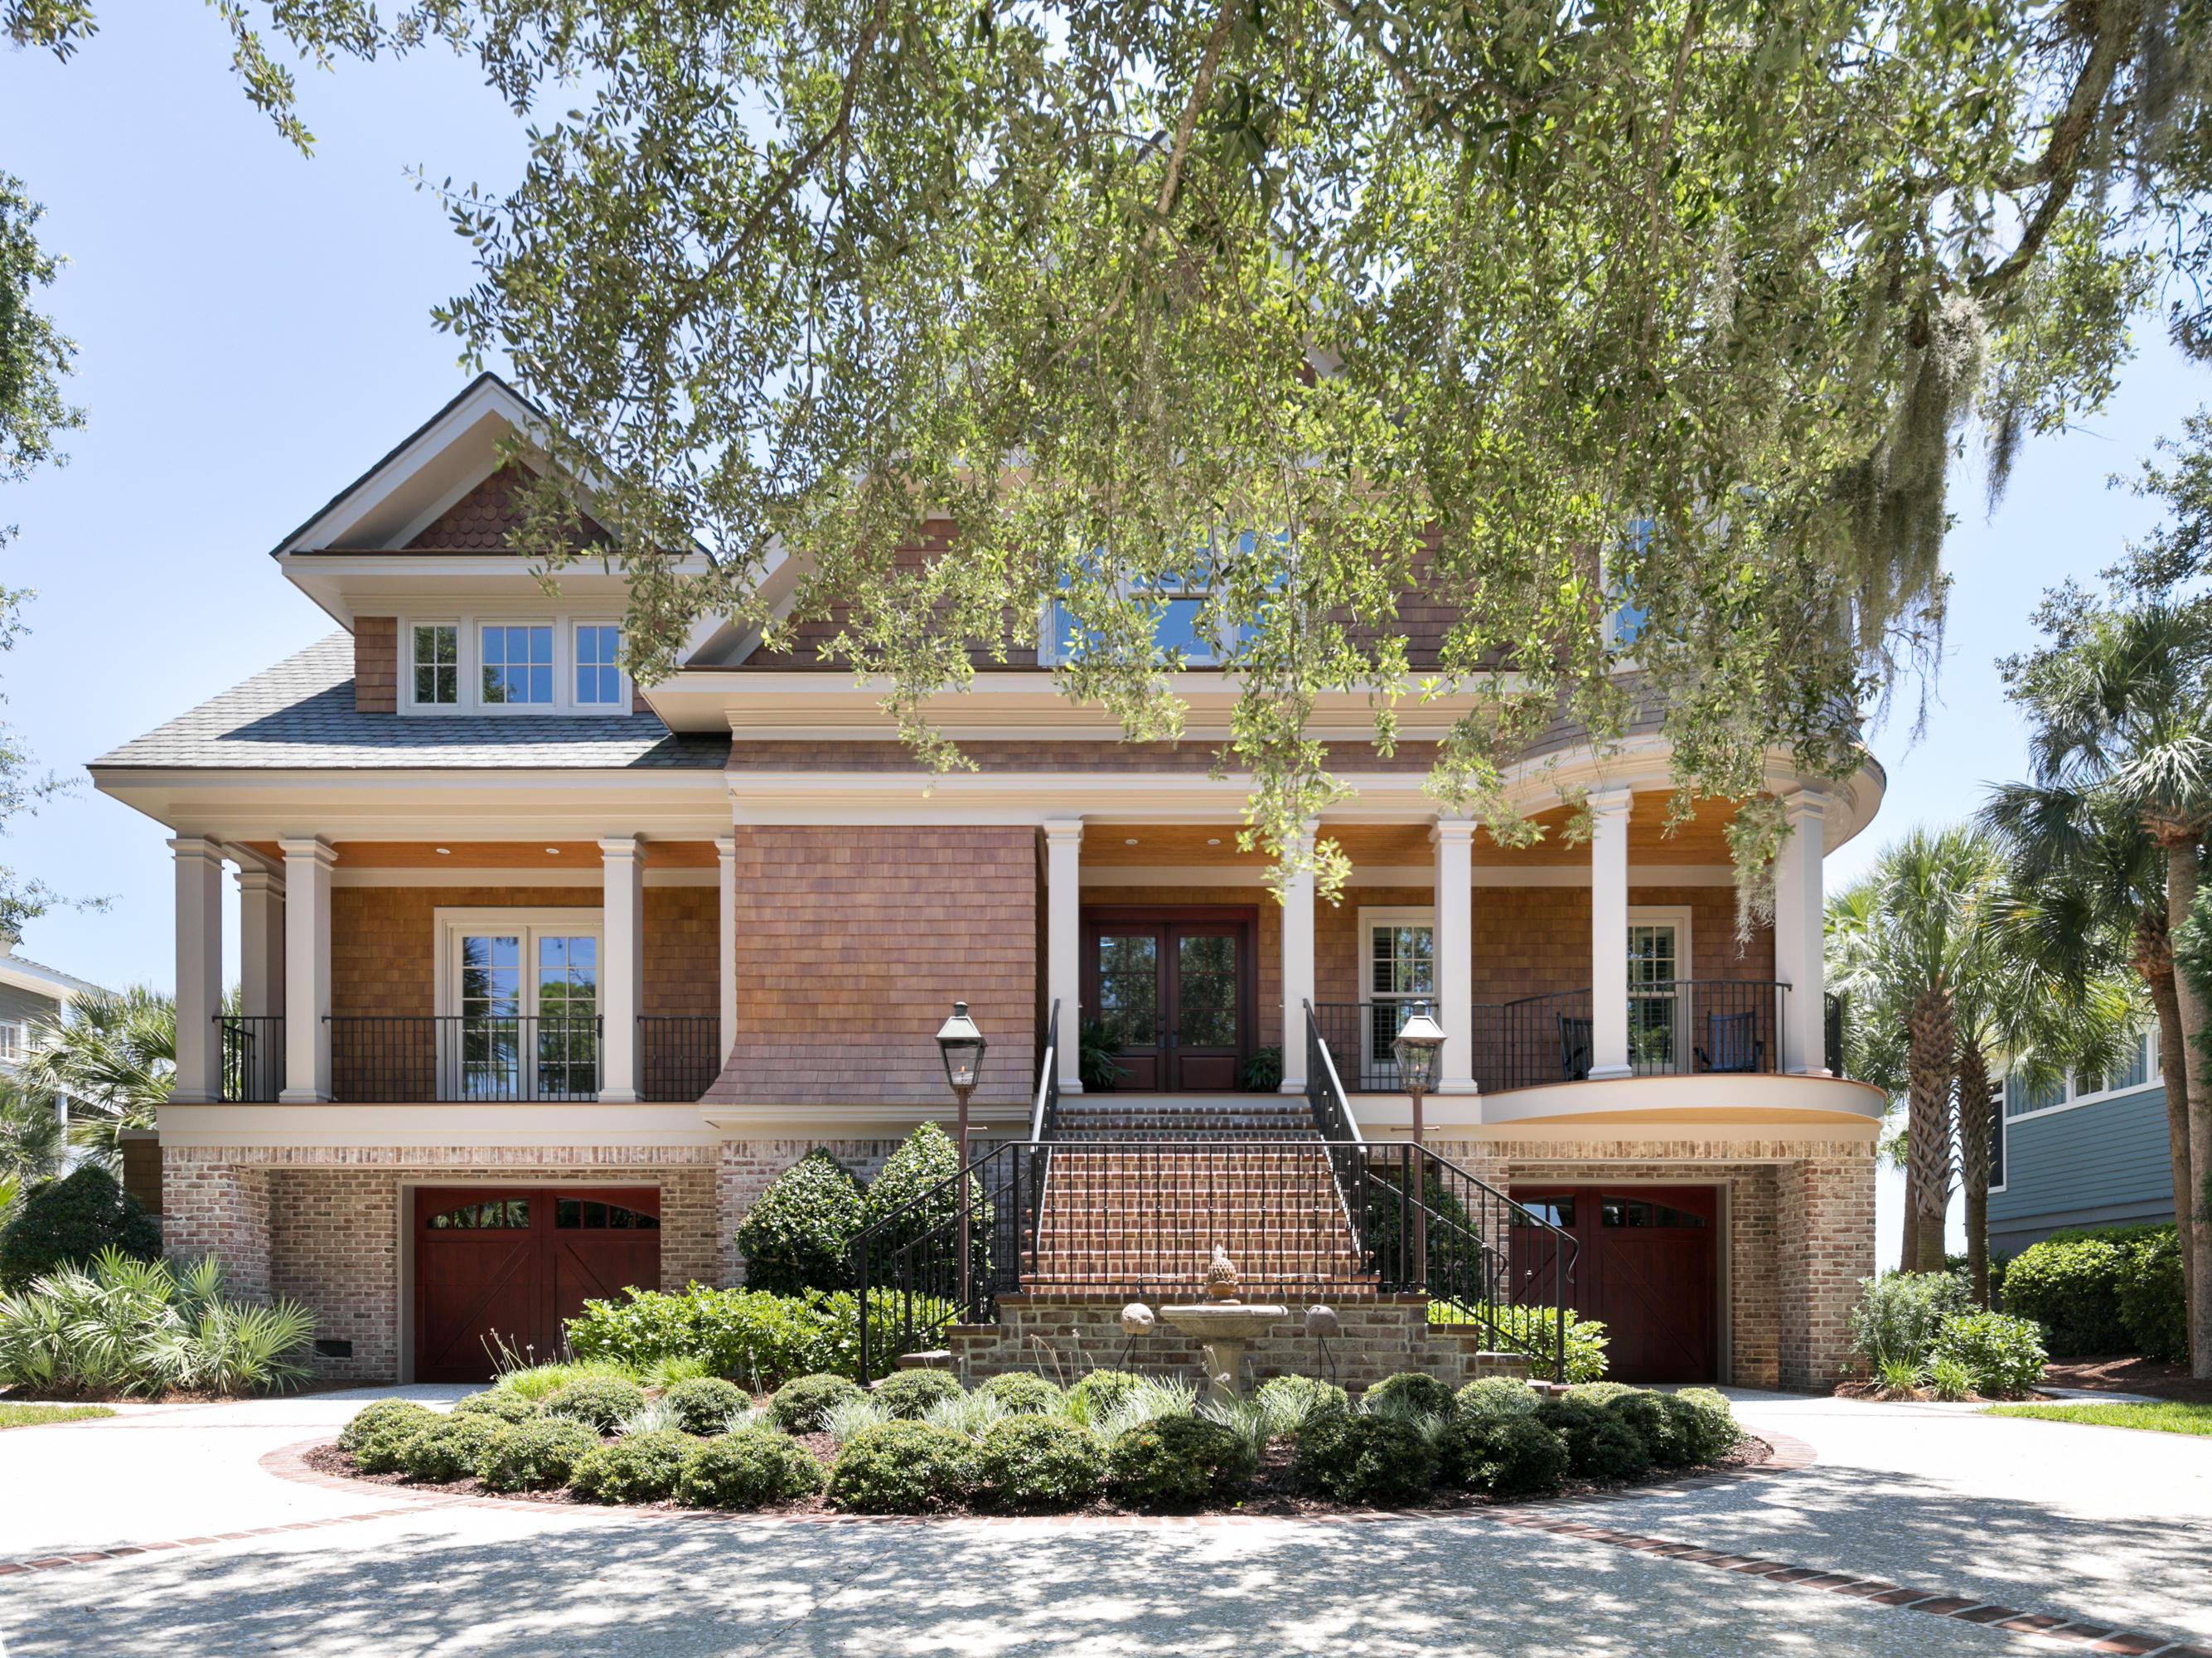 Seabrook Island Homes For Sale - 3037 Marshgate, Johns Island, SC - 55